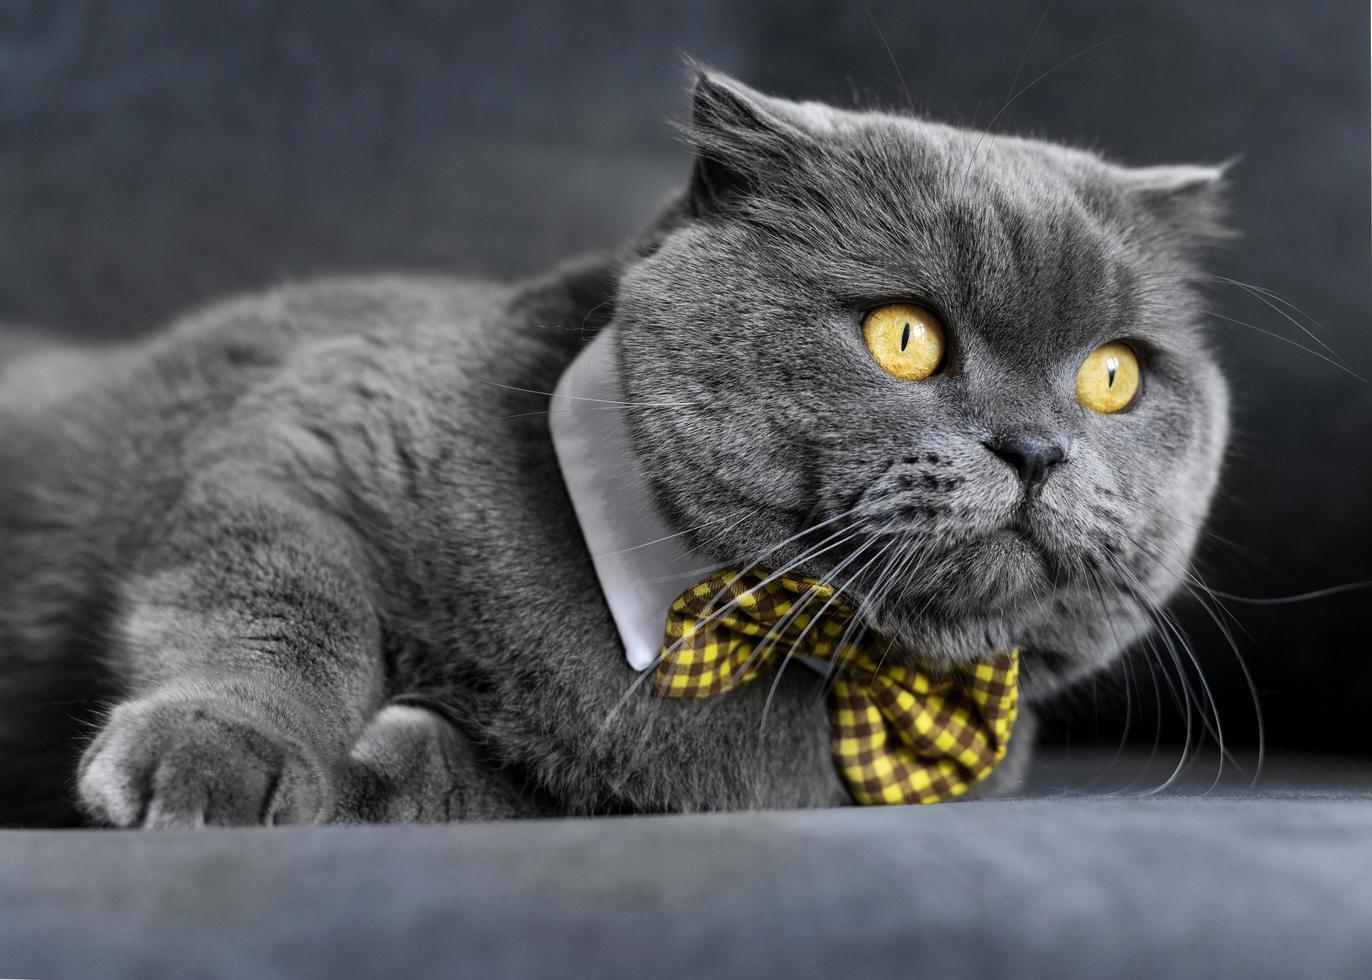 Cute grey cat wearing yellow bowtie photo